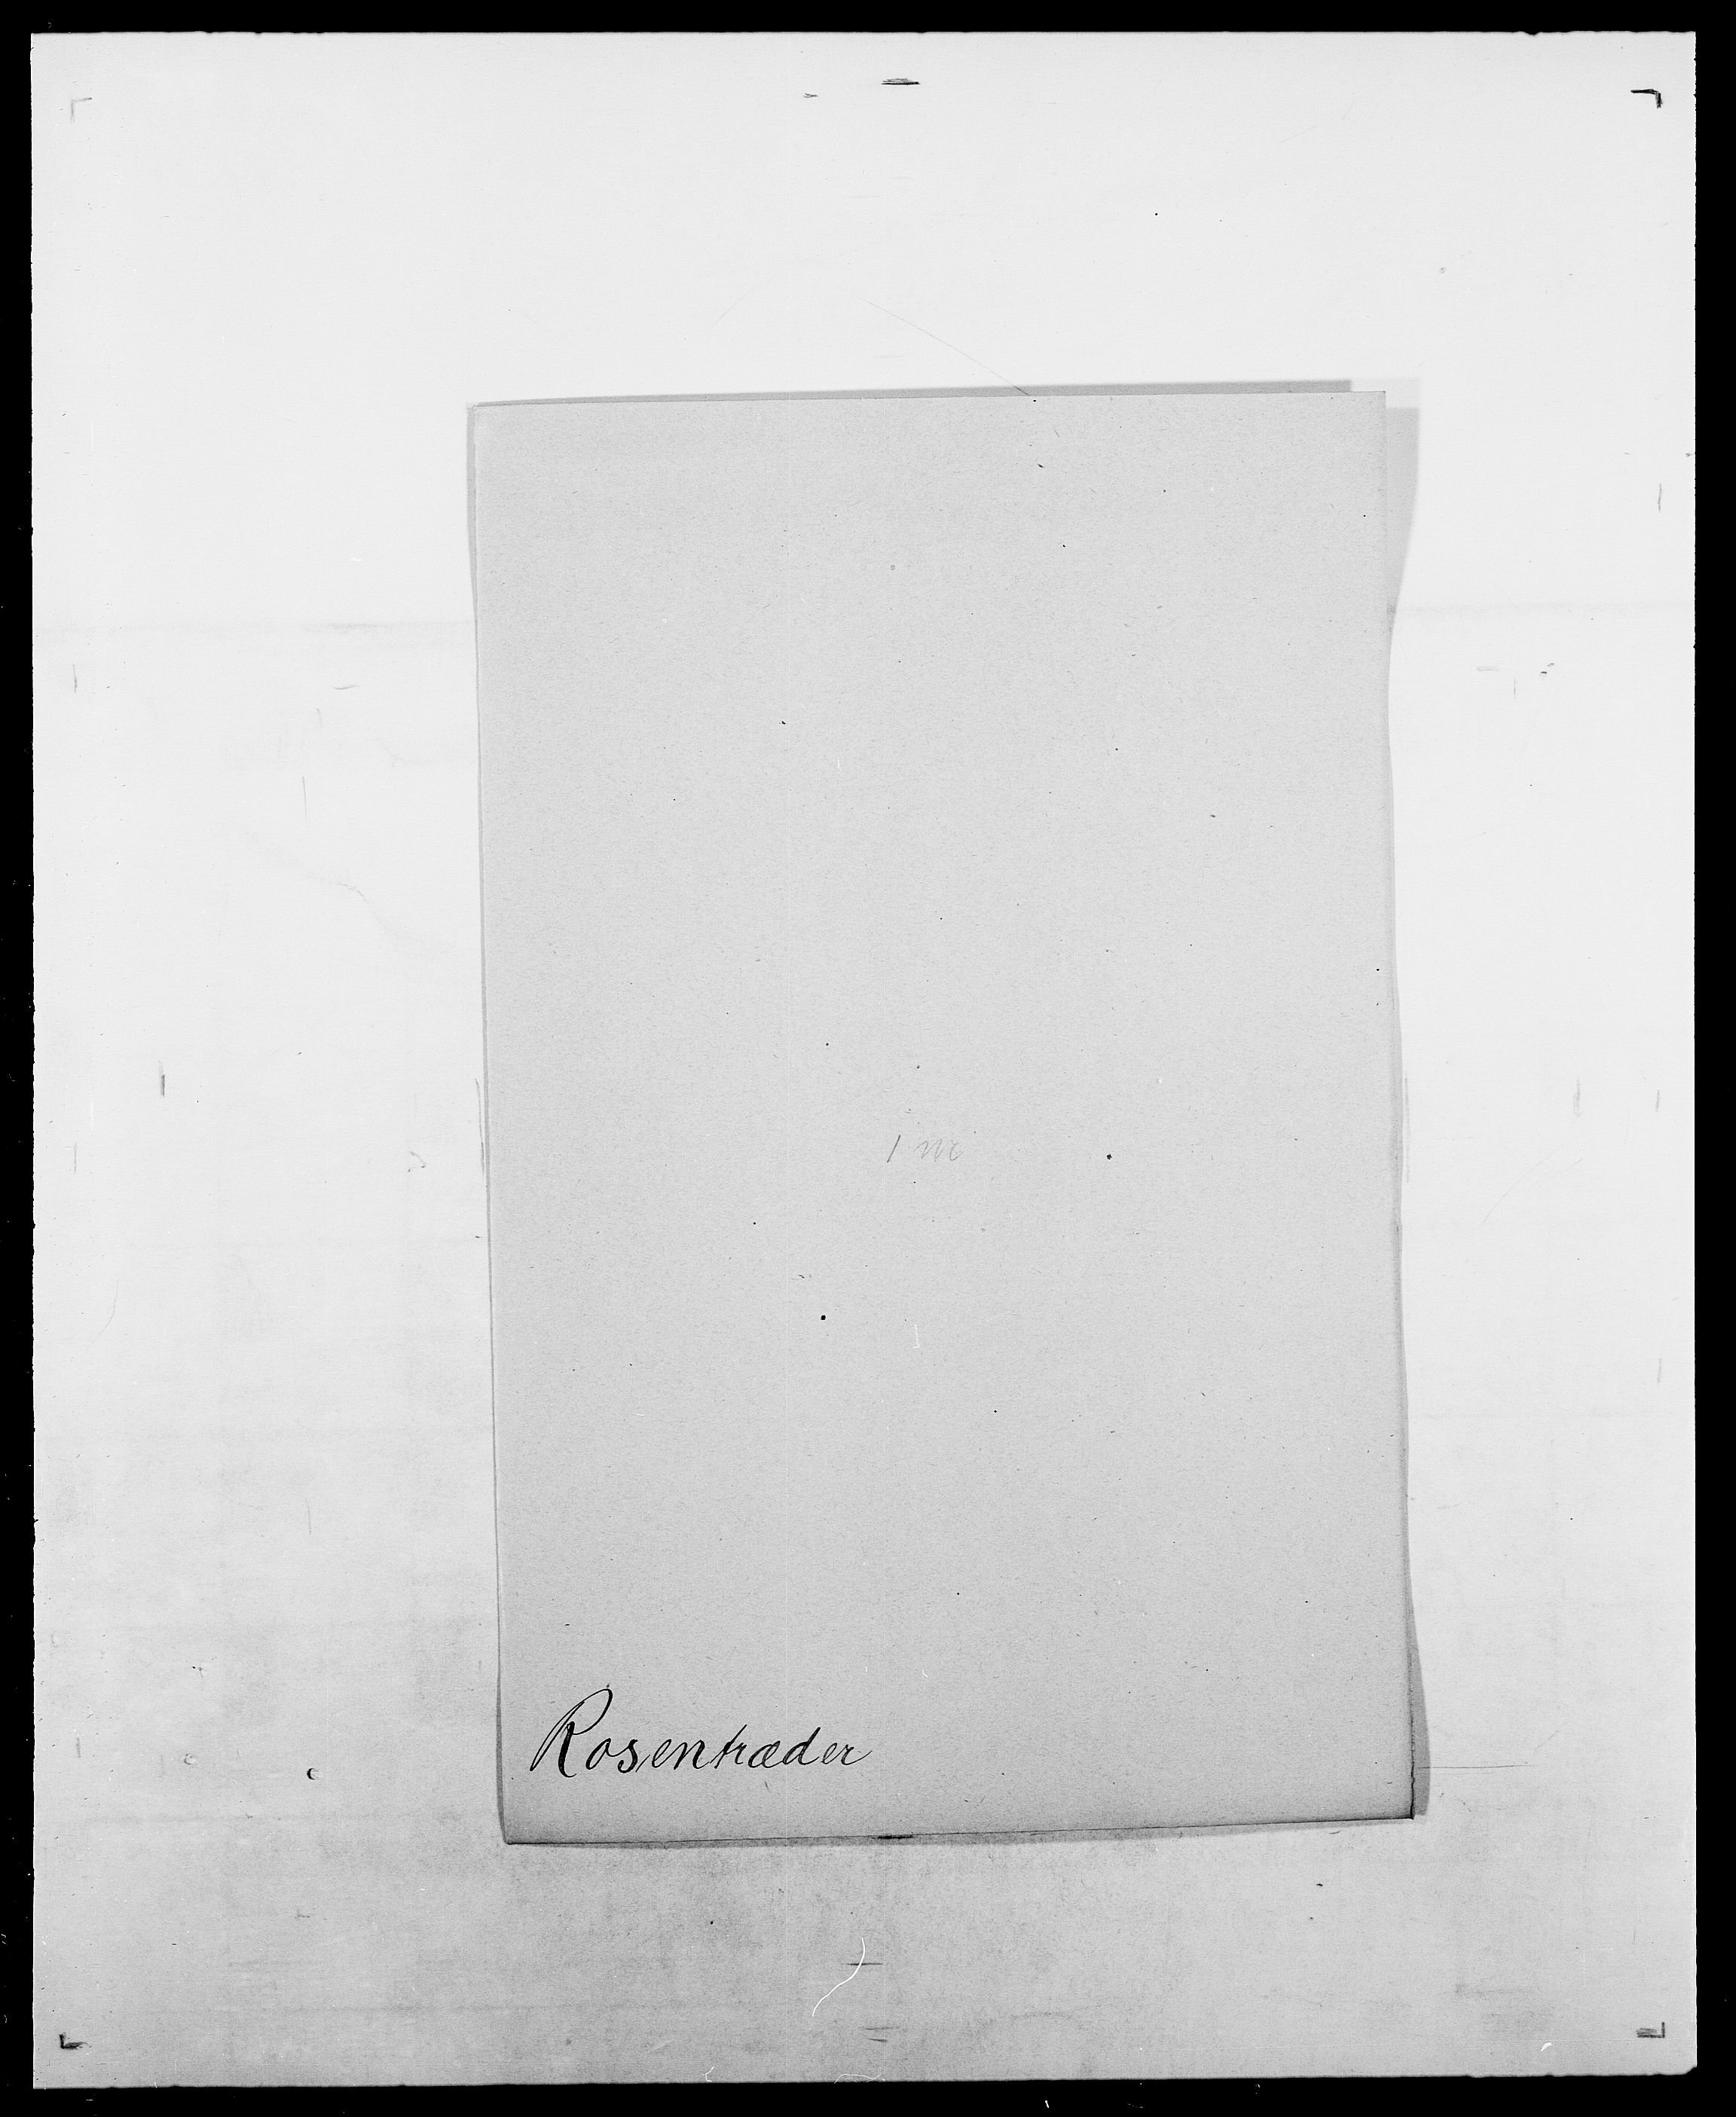 SAO, Delgobe, Charles Antoine - samling, D/Da/L0033: Roald - Røyem, s. 287